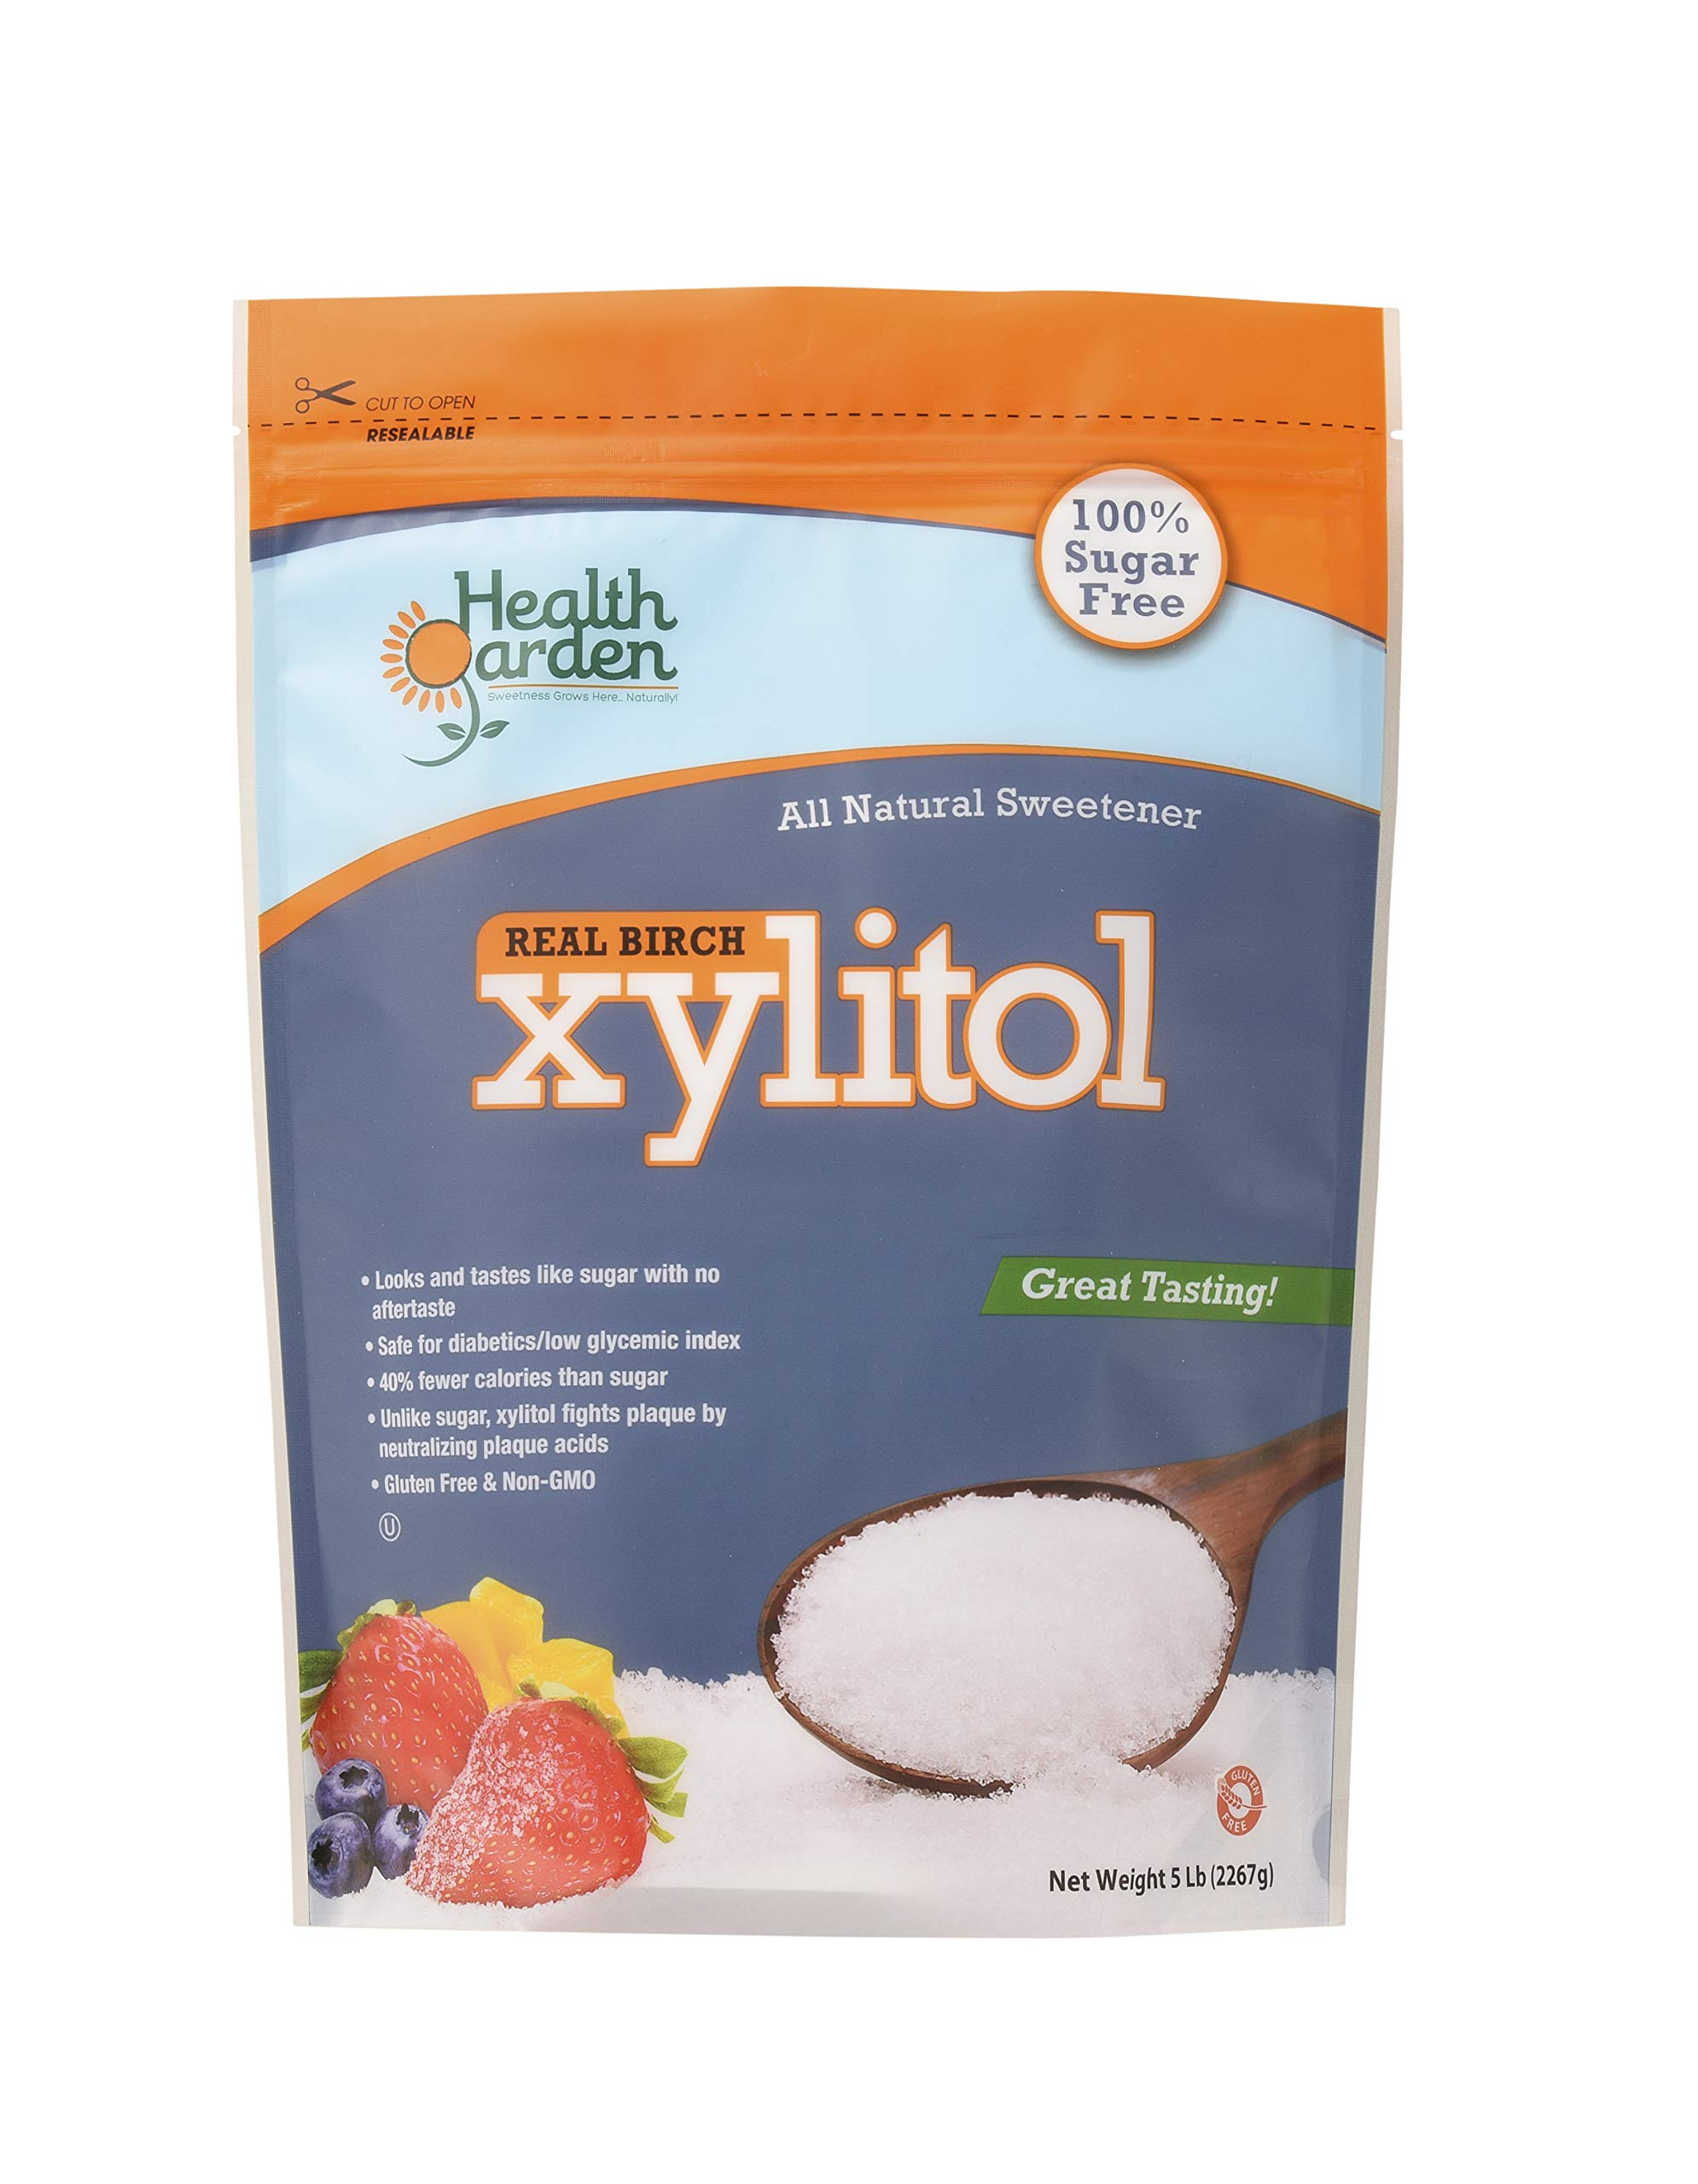 Health Garden Birch Xylitol Sugar Free Sweetener, All Natural, Non GMO (Not from Corn) 30 LB